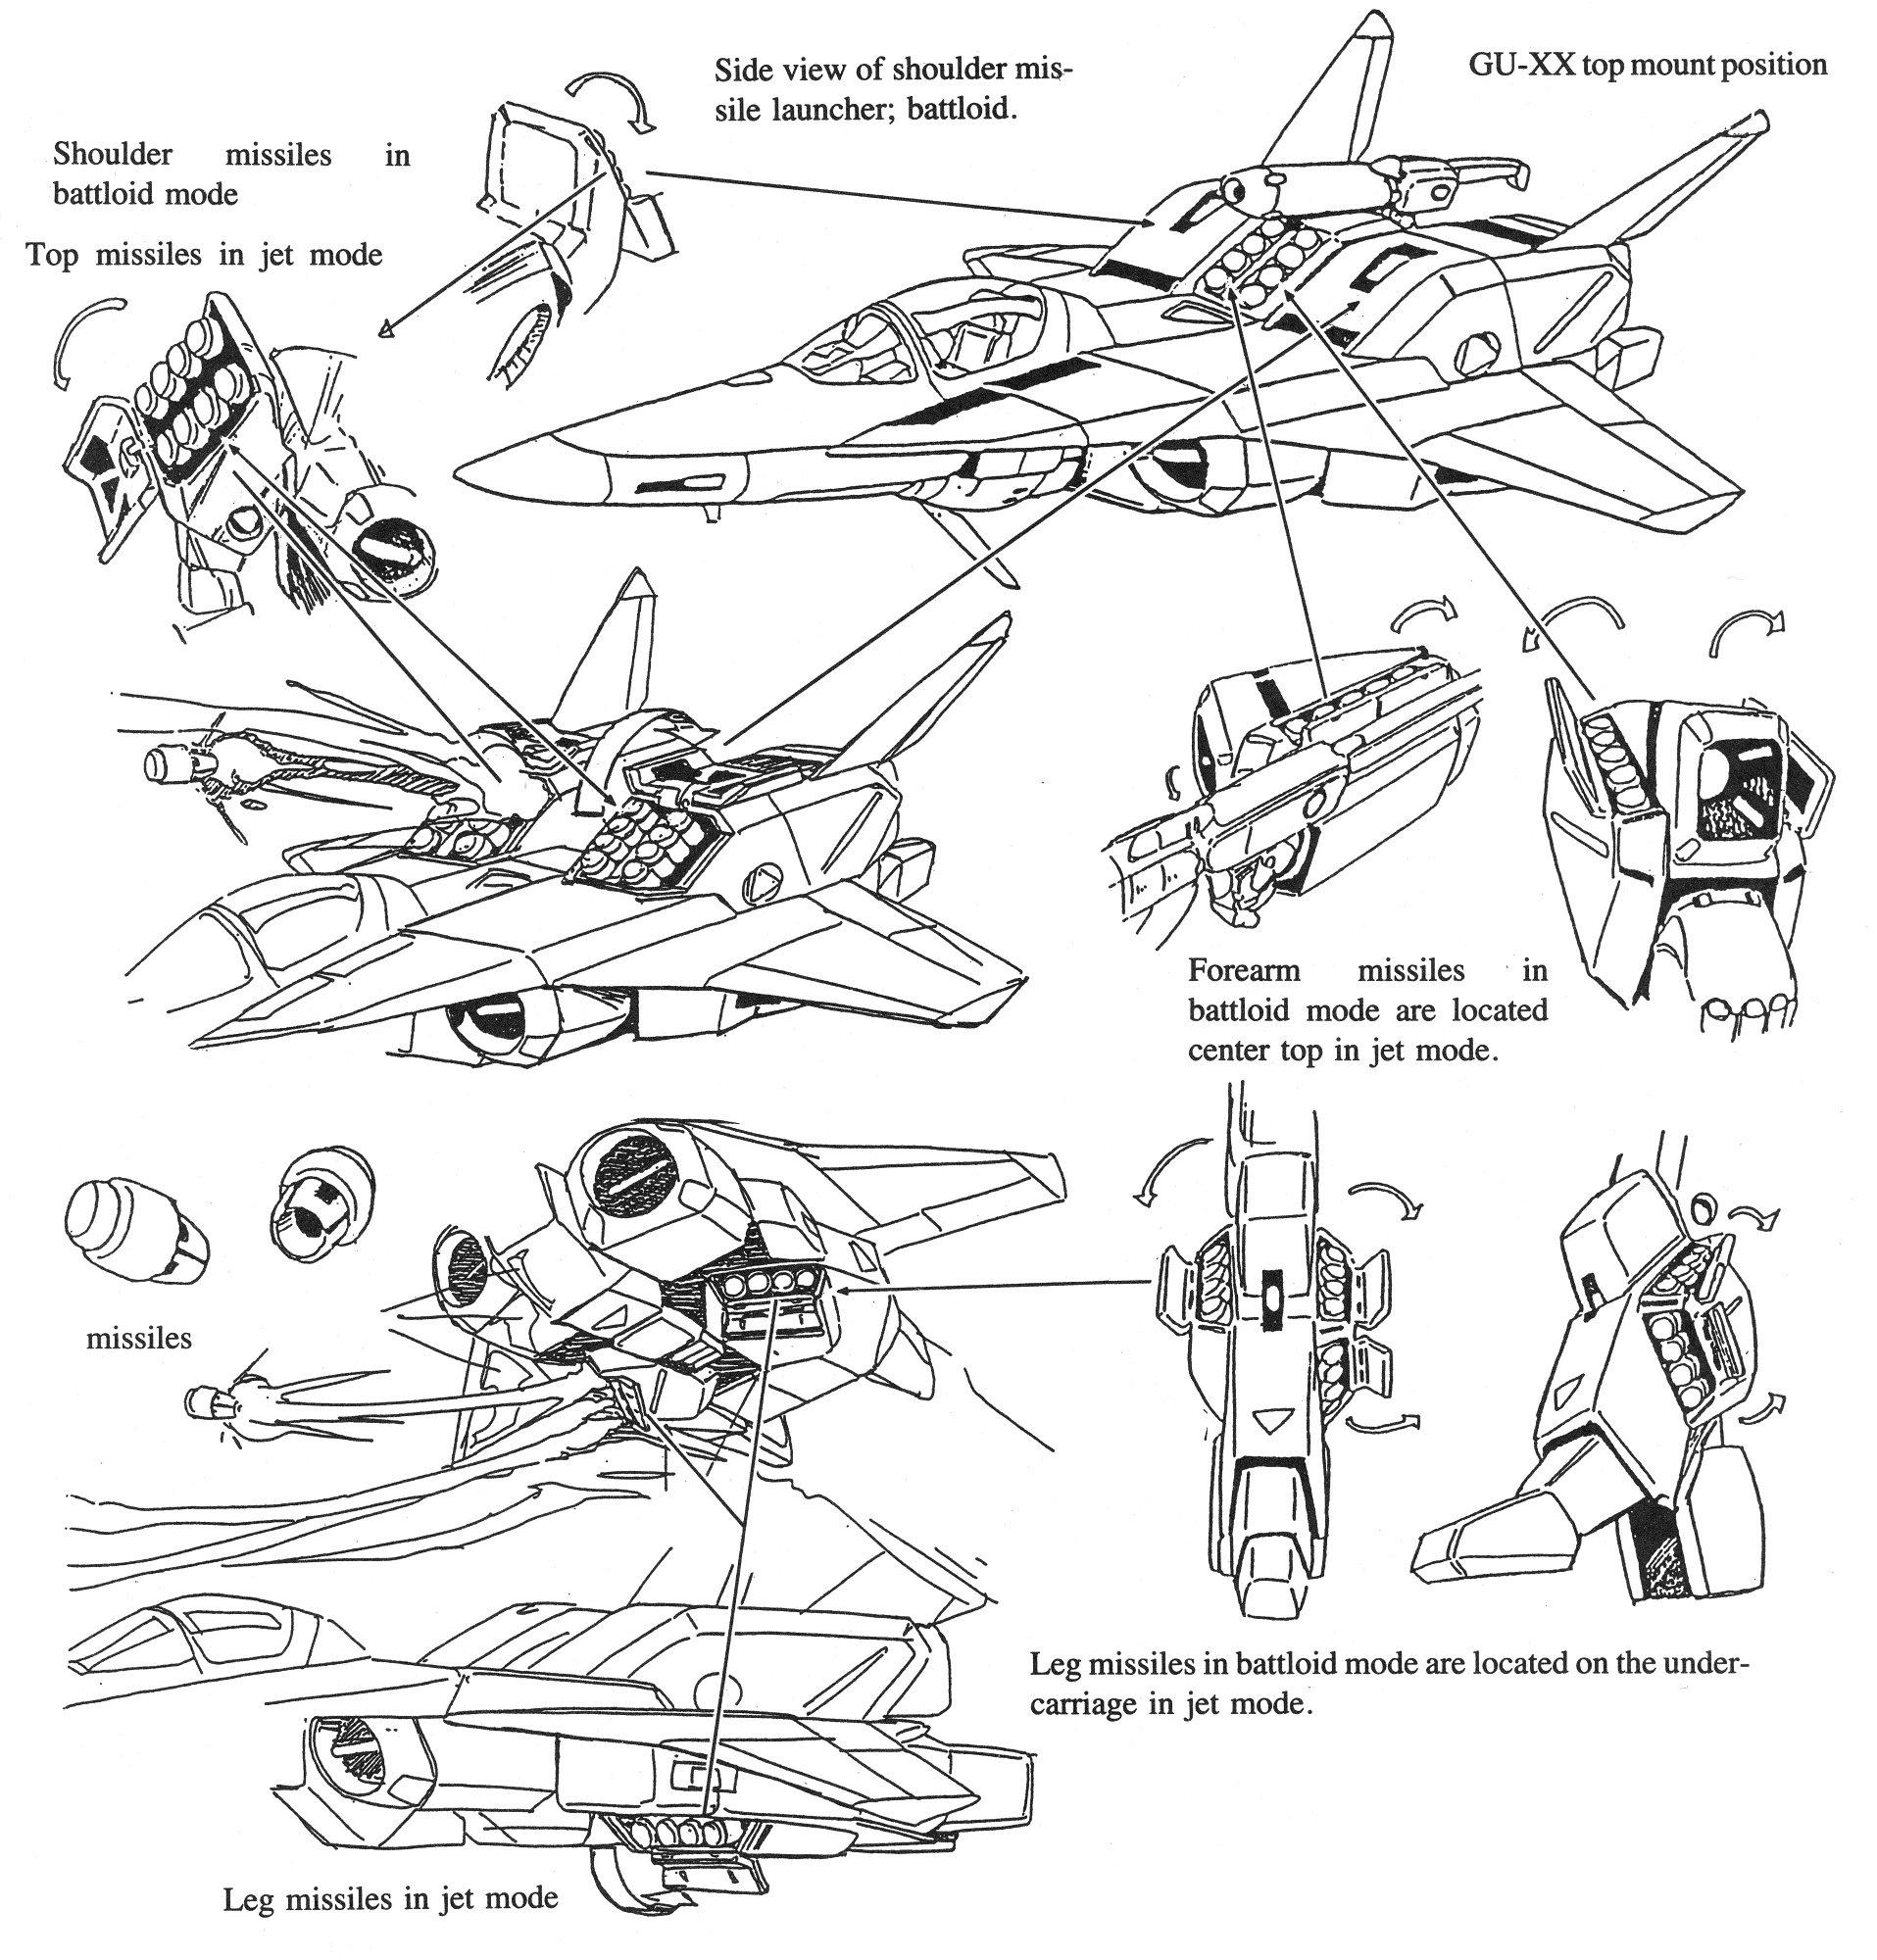 2DD7F38E-CE04-4AFA-A12A-0A159D07481F.jpeg